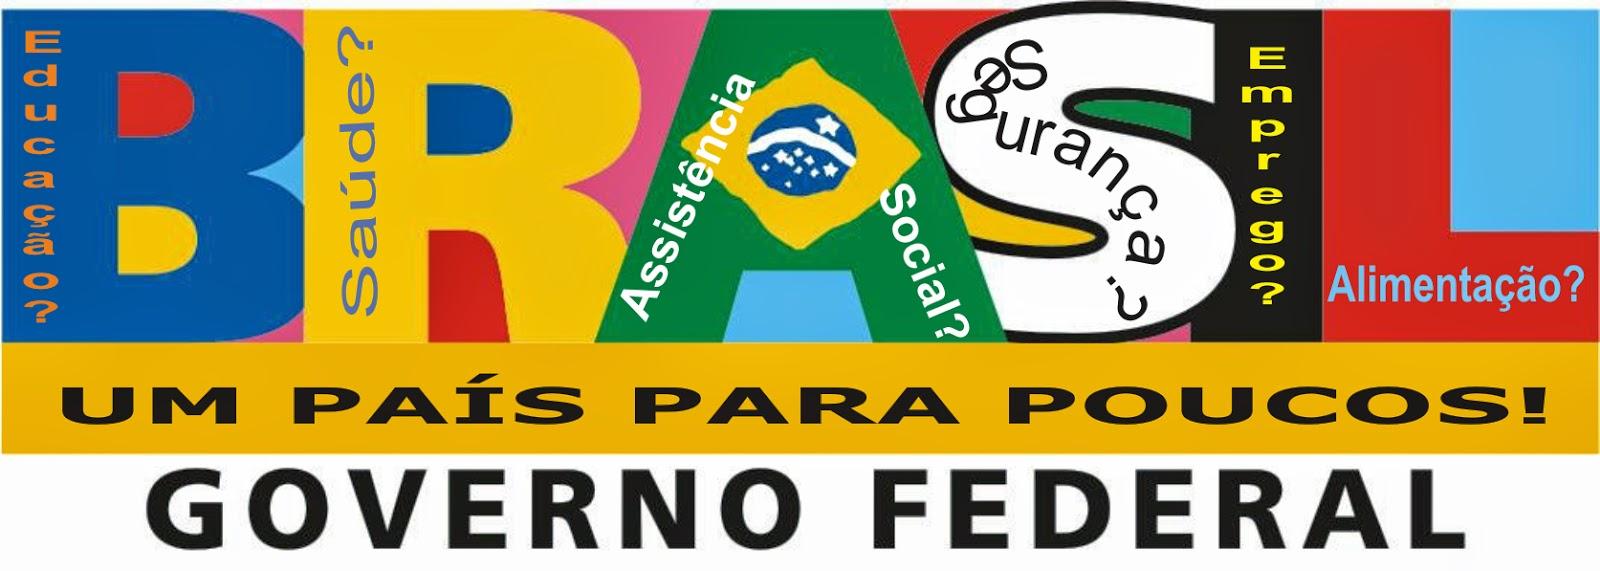 brasil, país de poucos